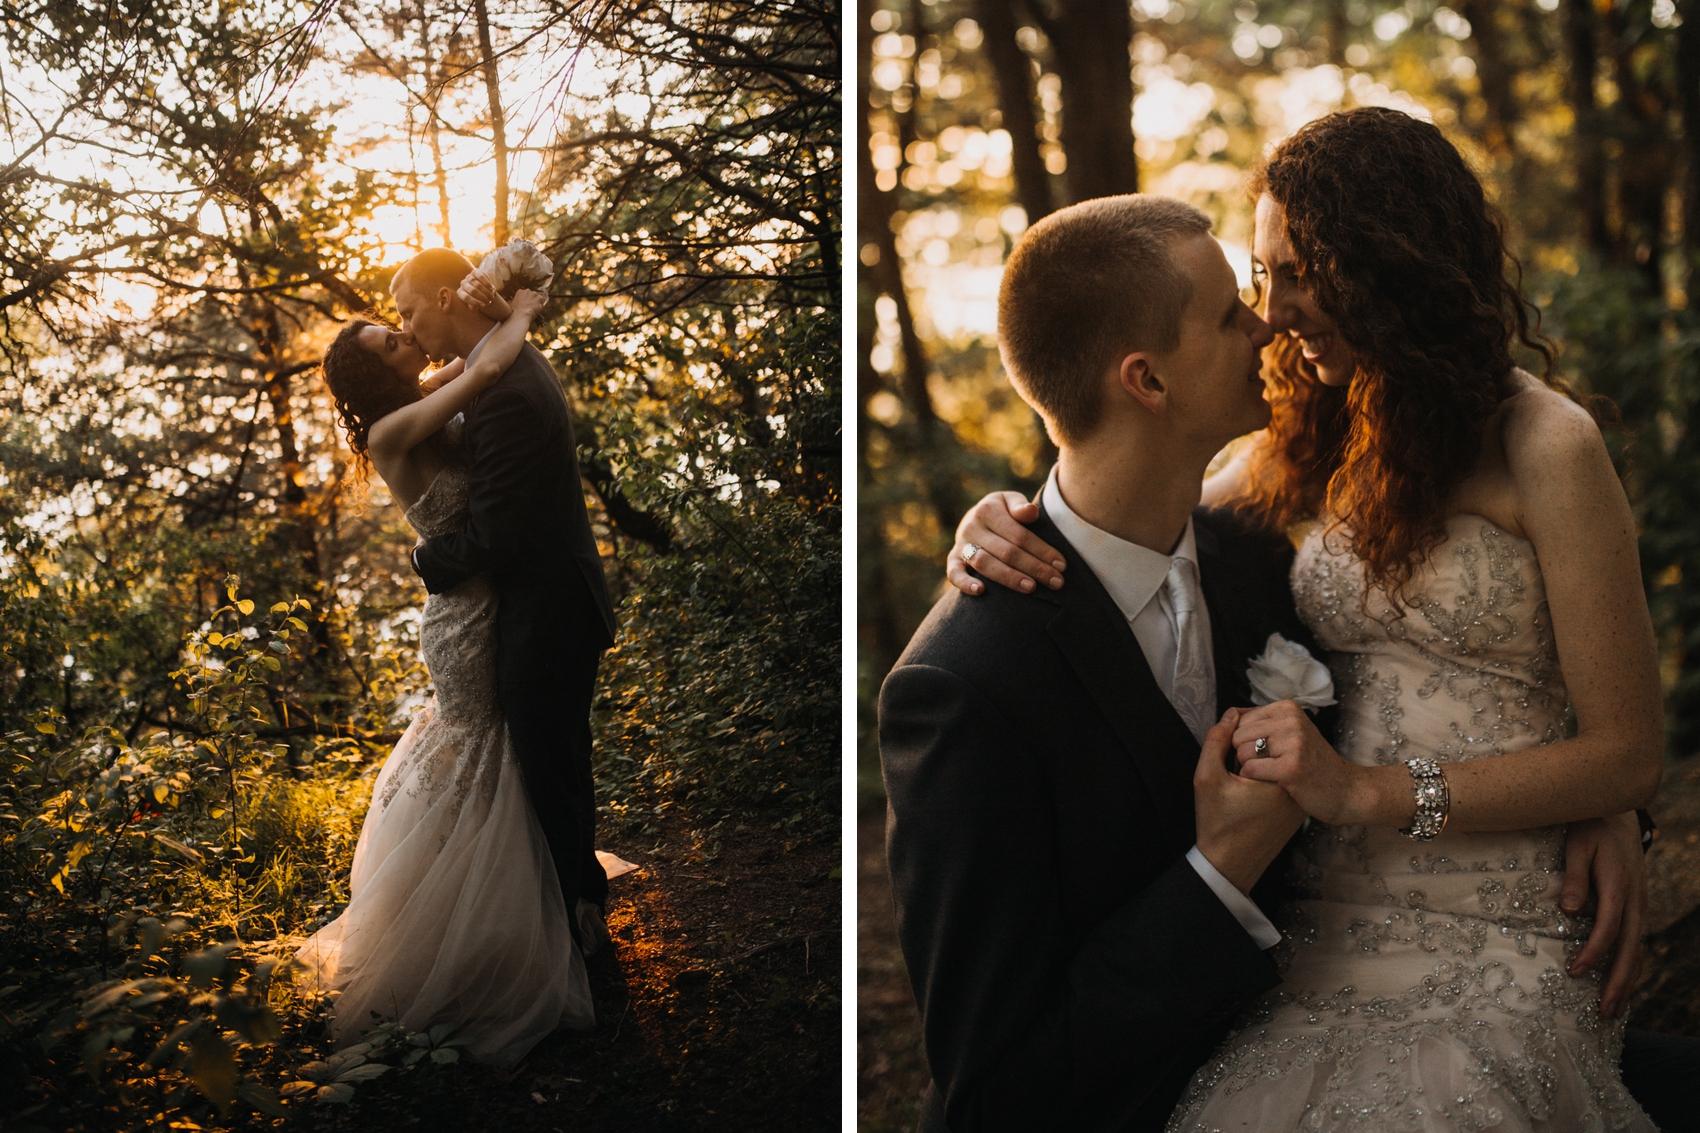 romantic-sunset-wedding-photos015-016.jpg